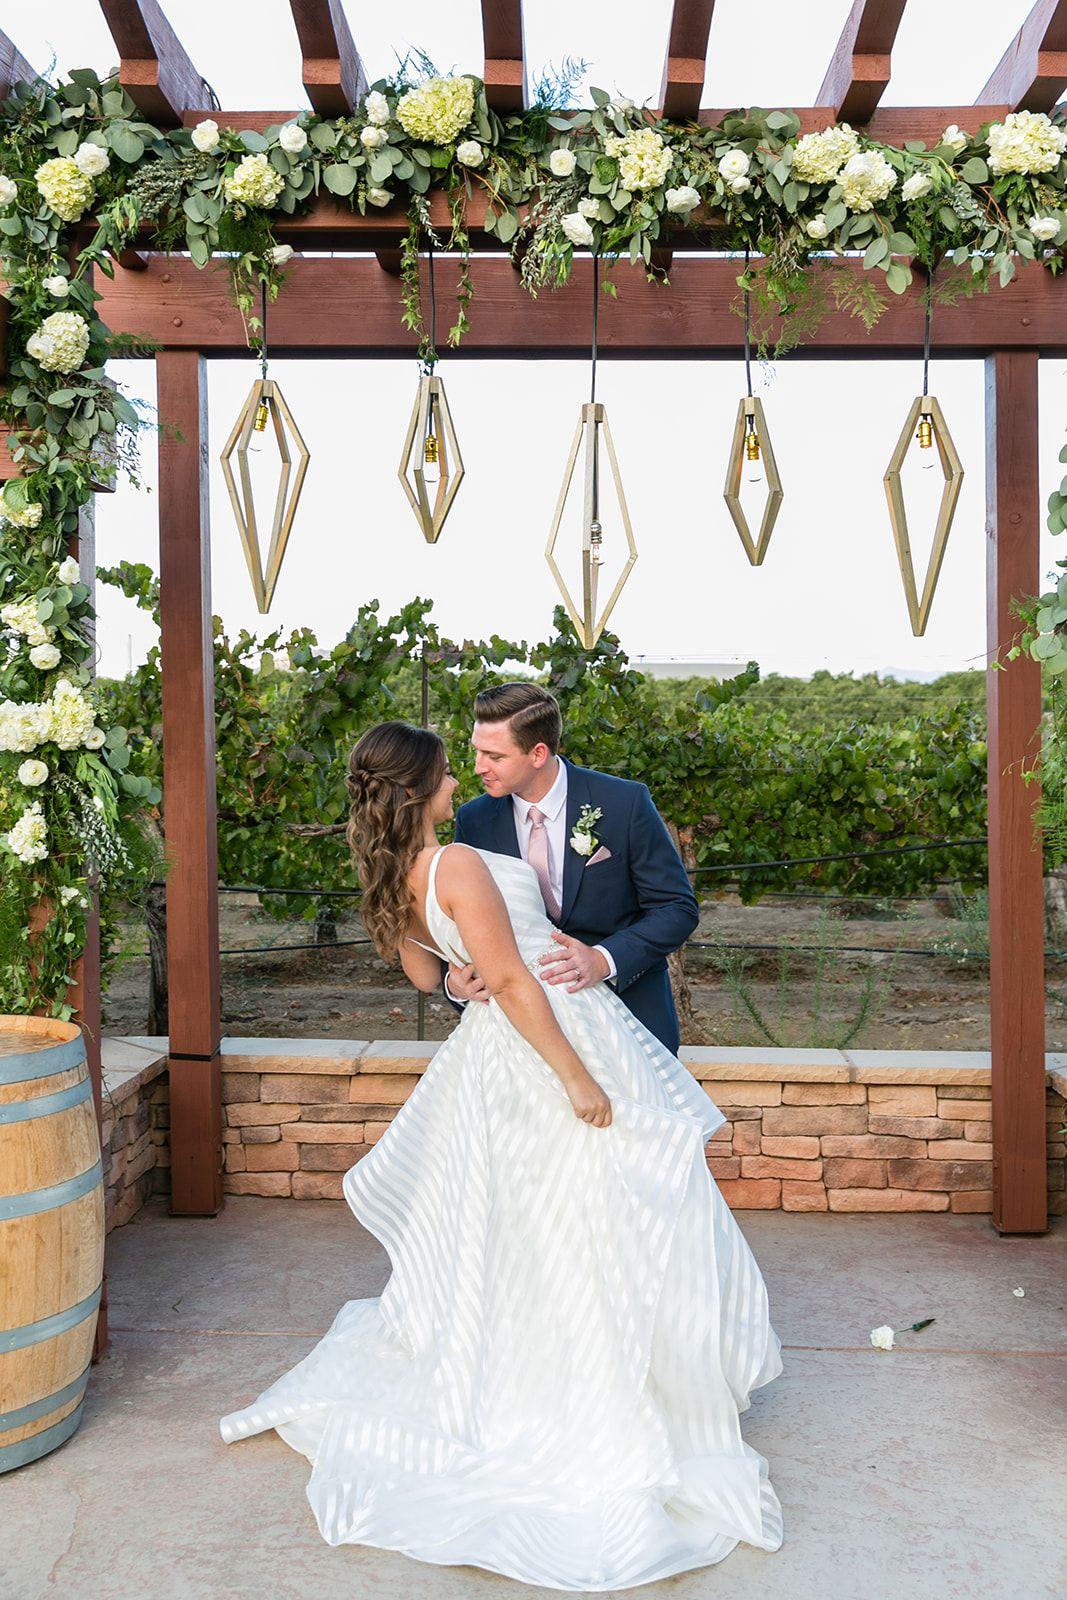 Bride and groom winery wedding Wiens Family Cellars